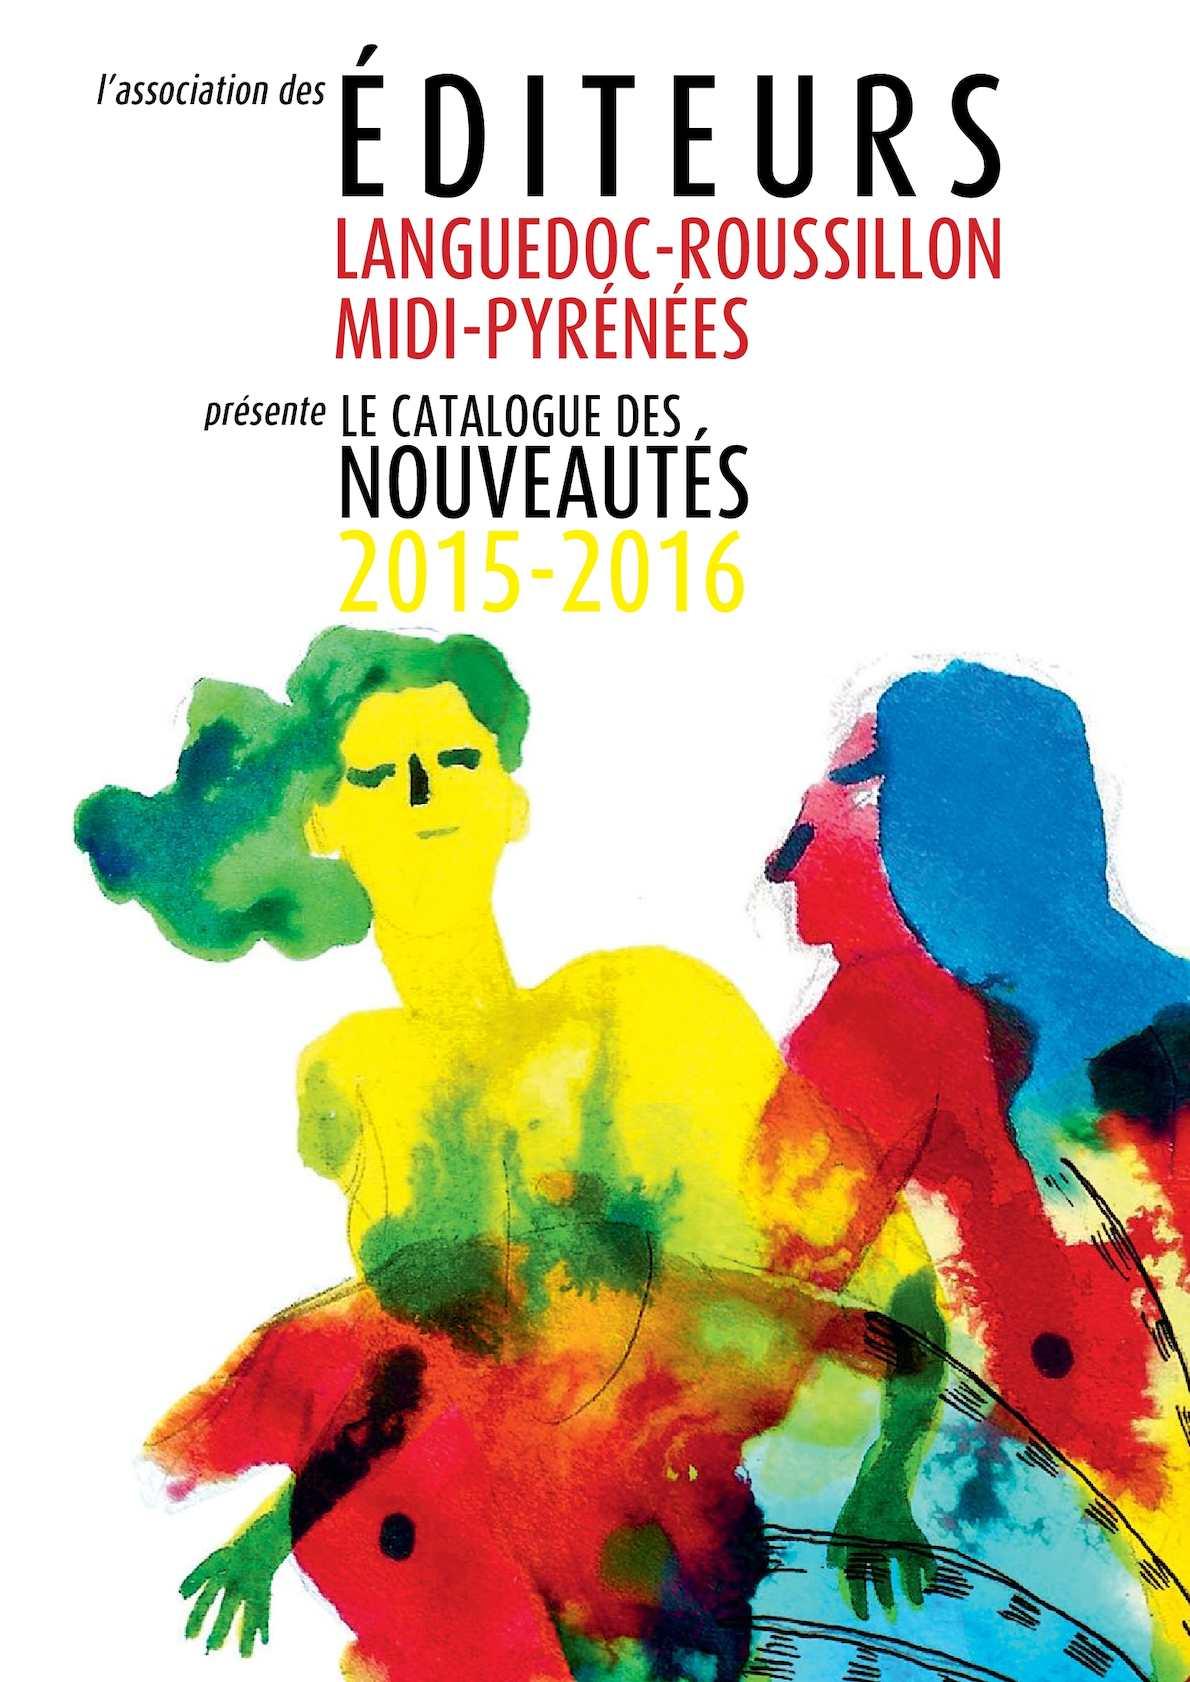 Tissage Mural Julie Oili calaméo - cat 2016 editeurs lrmp web